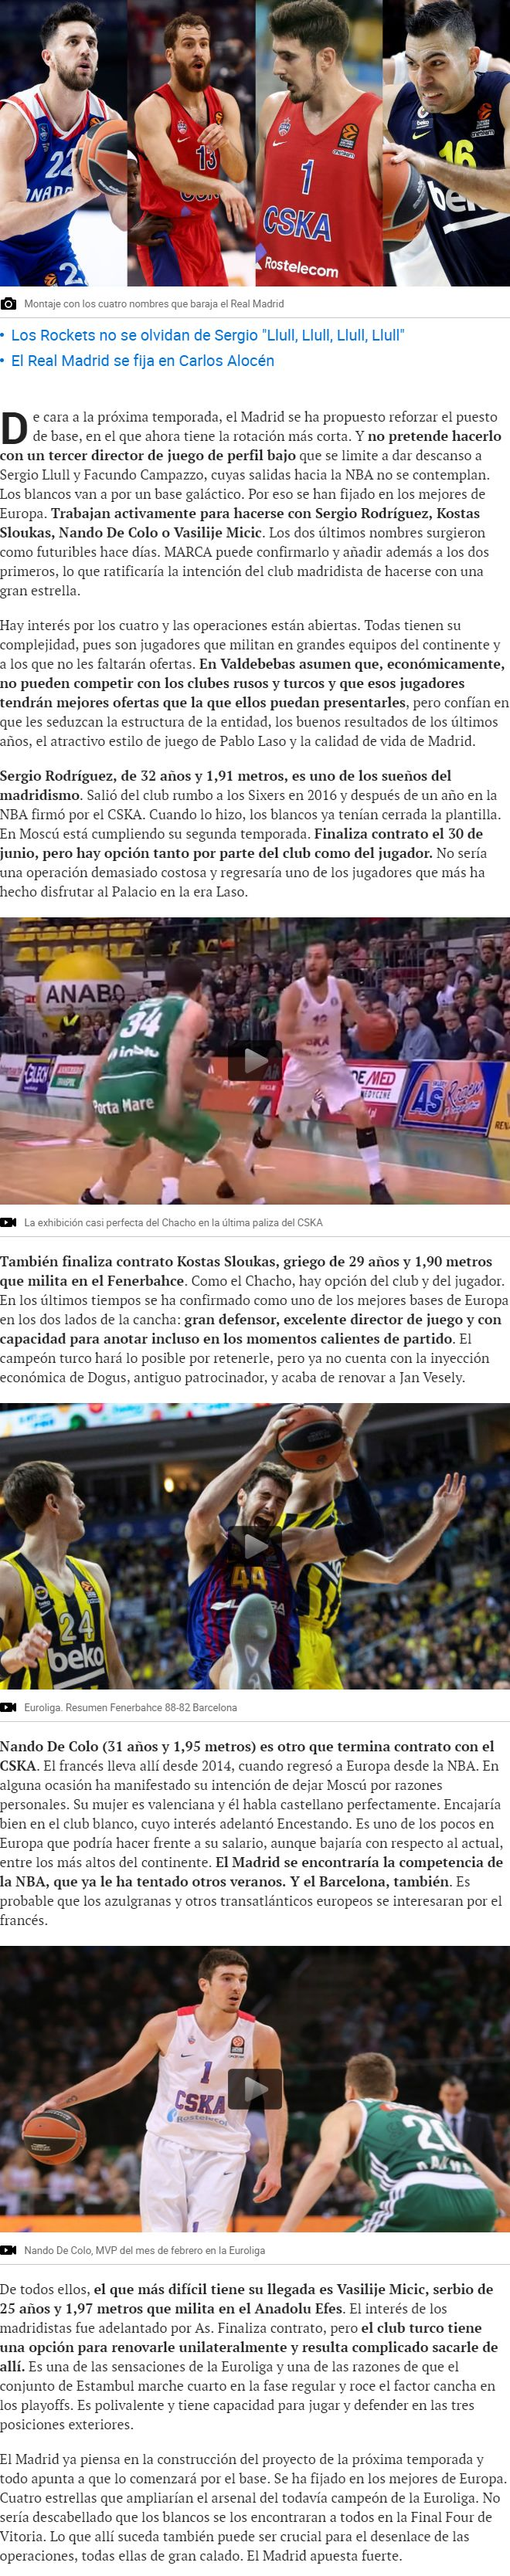 Fichajes Real Madrid Baloncesto - Página 9 1130440379